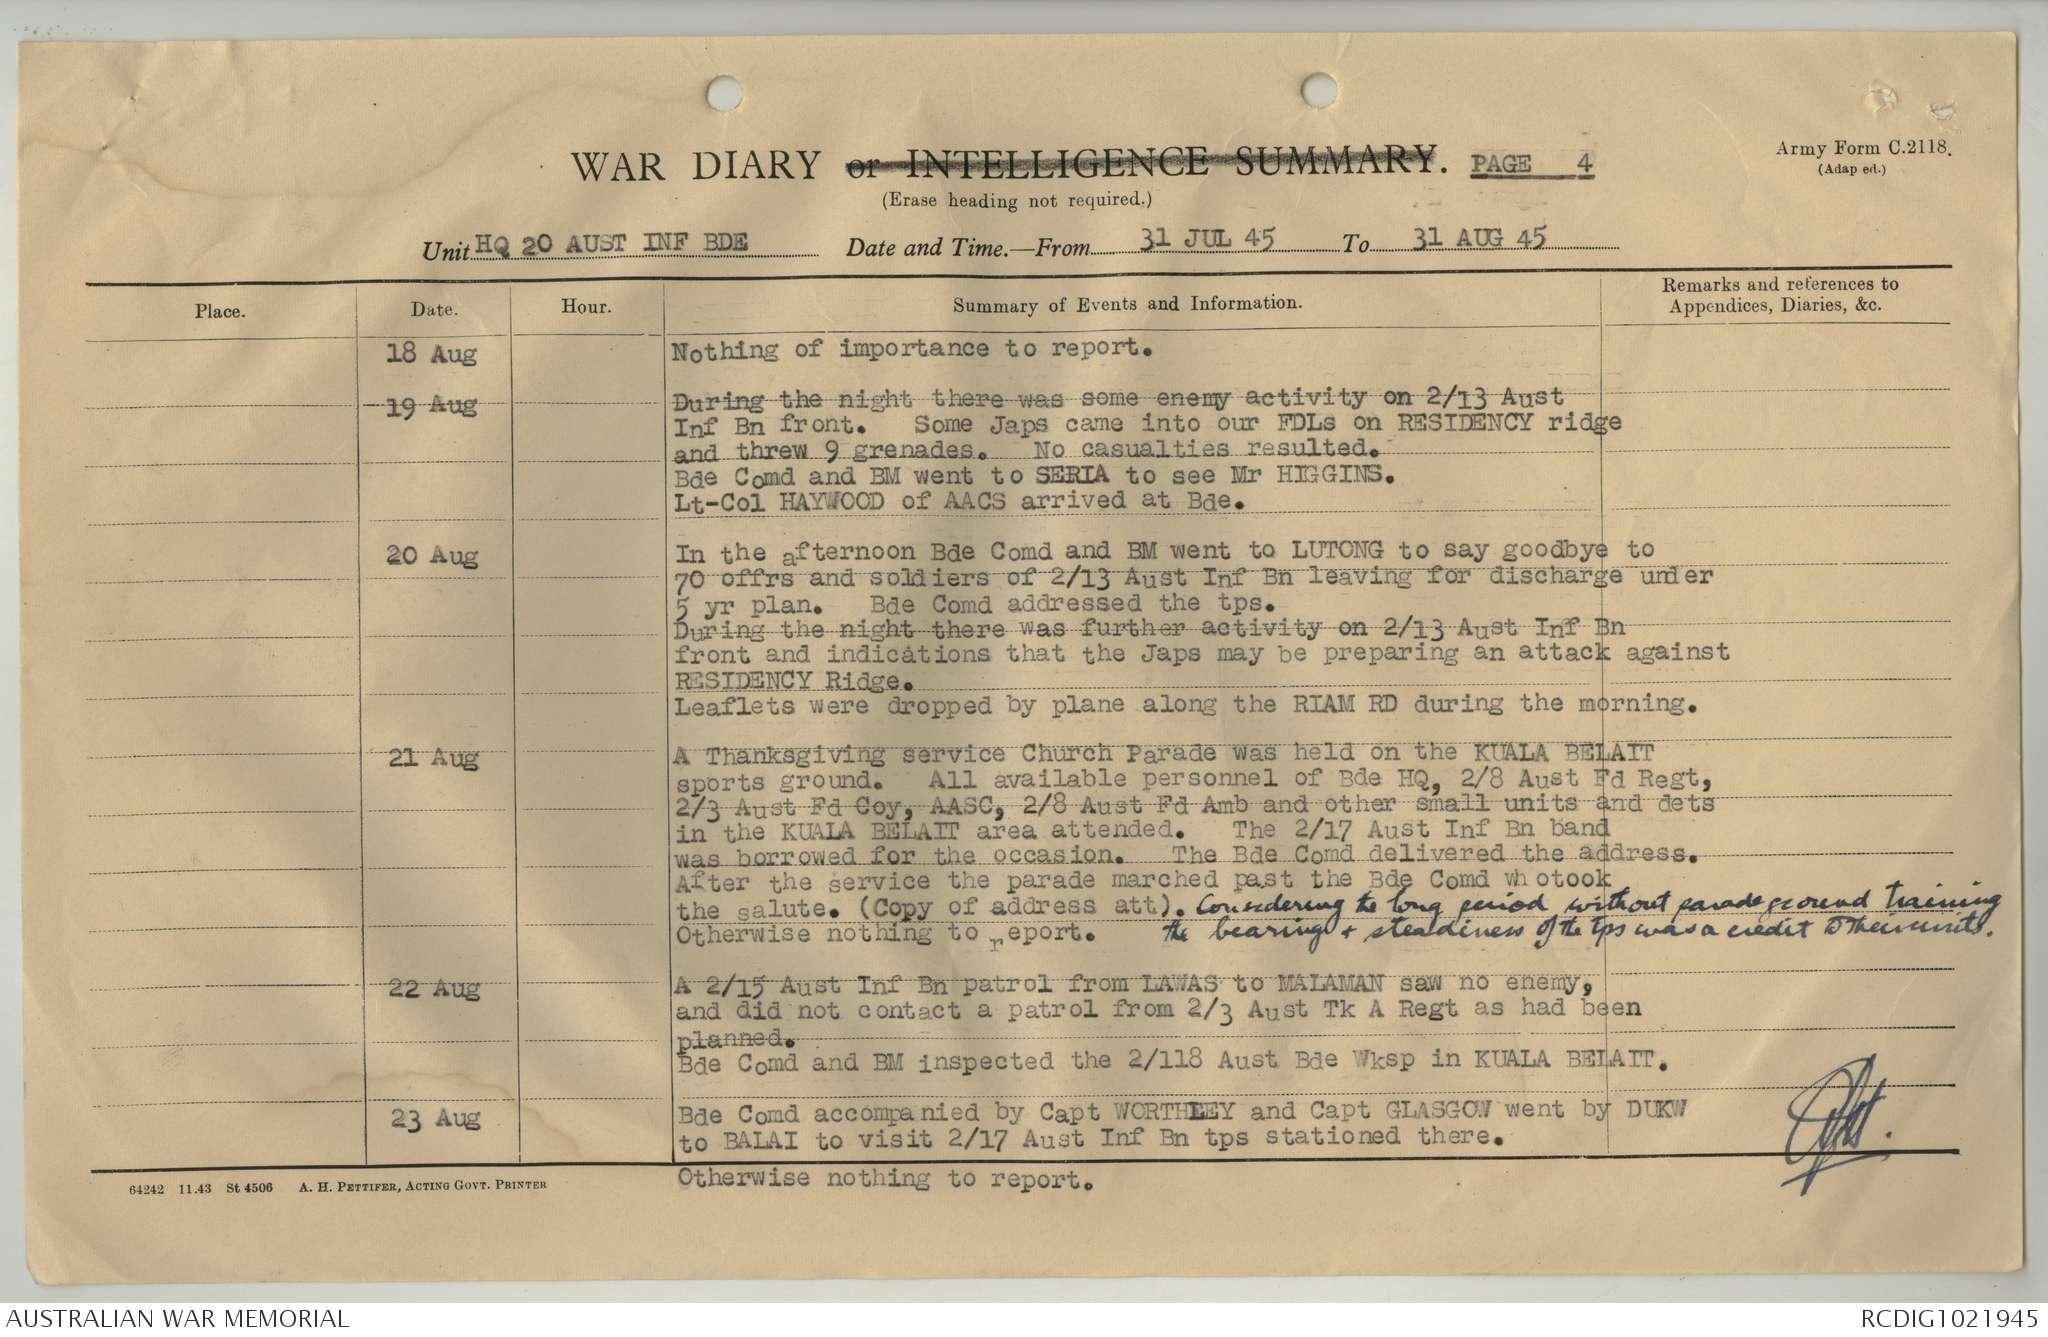 AWM52 8/2/20/117 - August 1945 - February 1946 | The Australian War